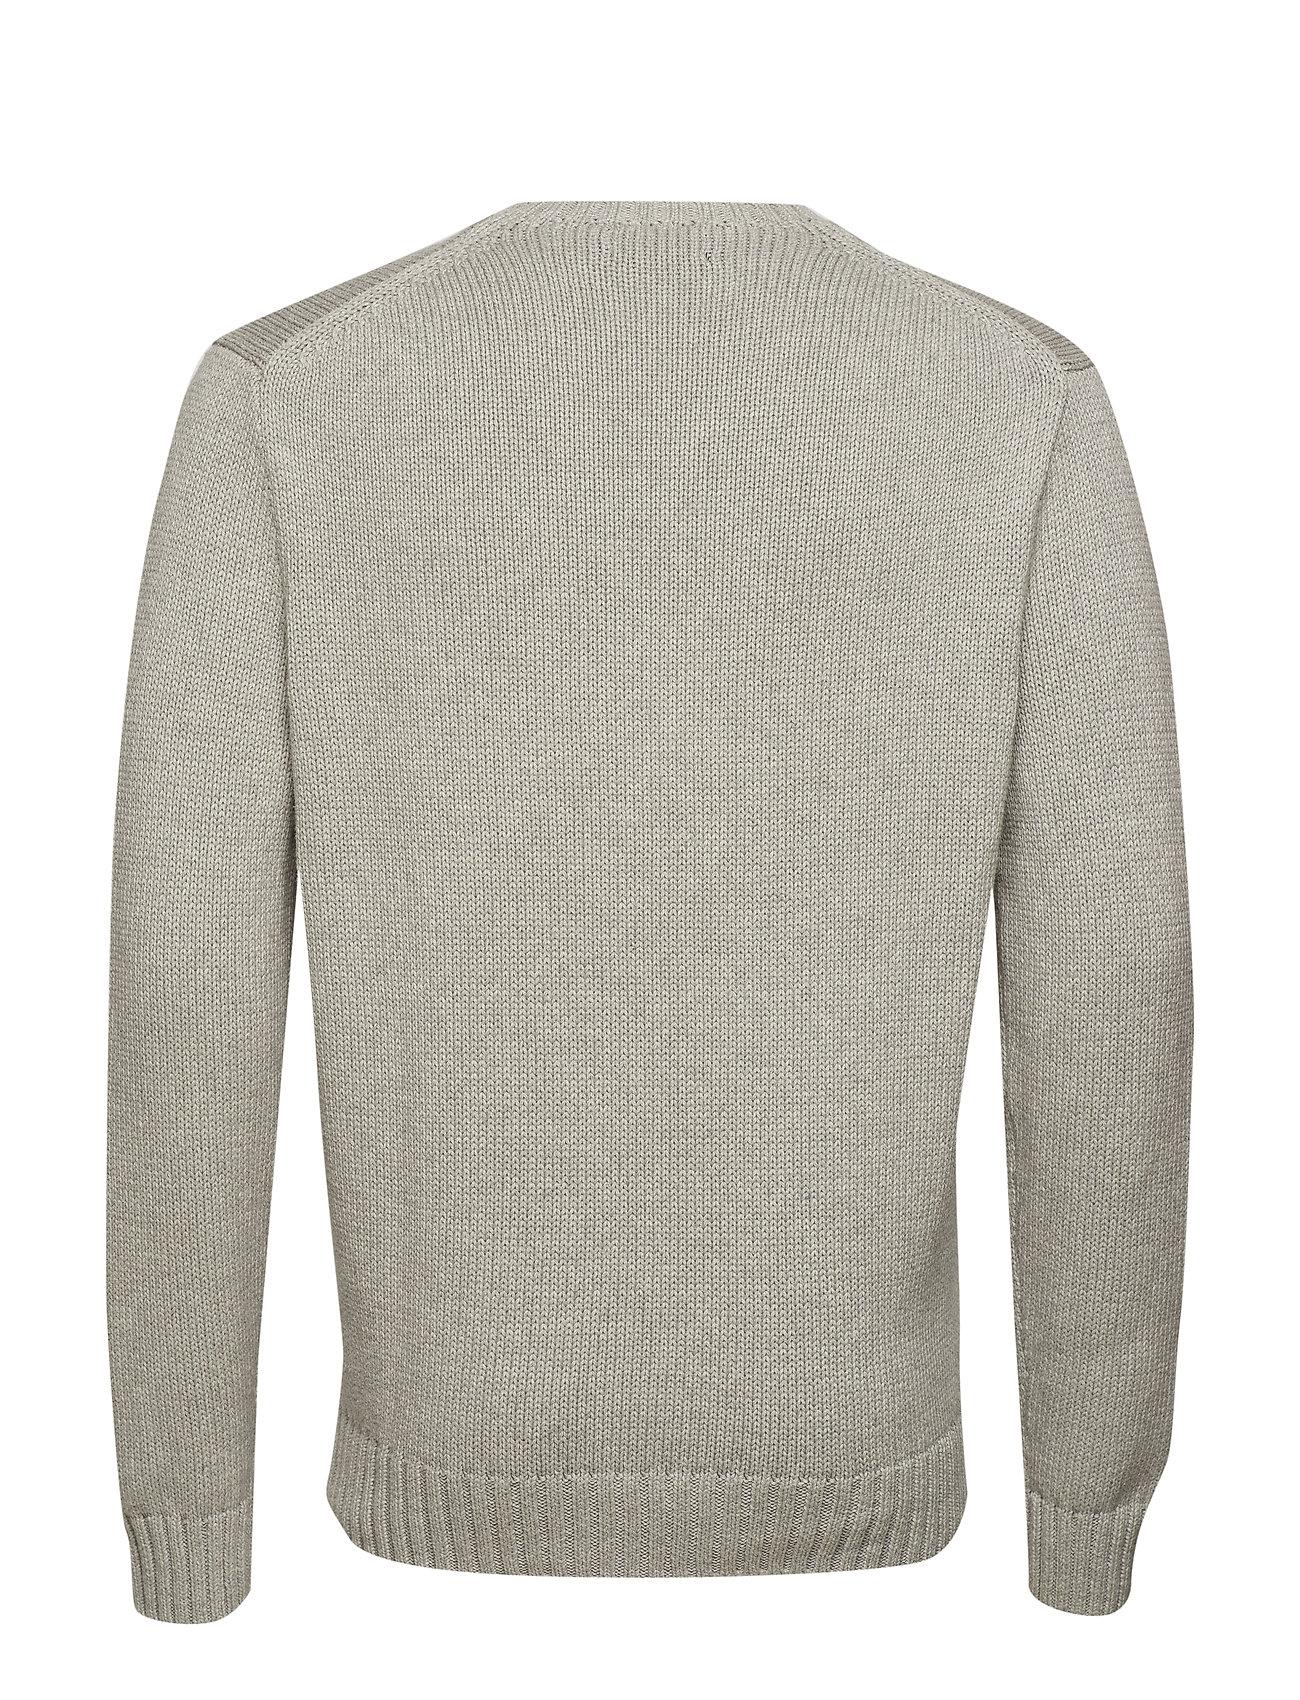 Ralph HeatherPolo Sleeve Ls sweaterandover Lauren Pp long Cn vN0O8ymnPw